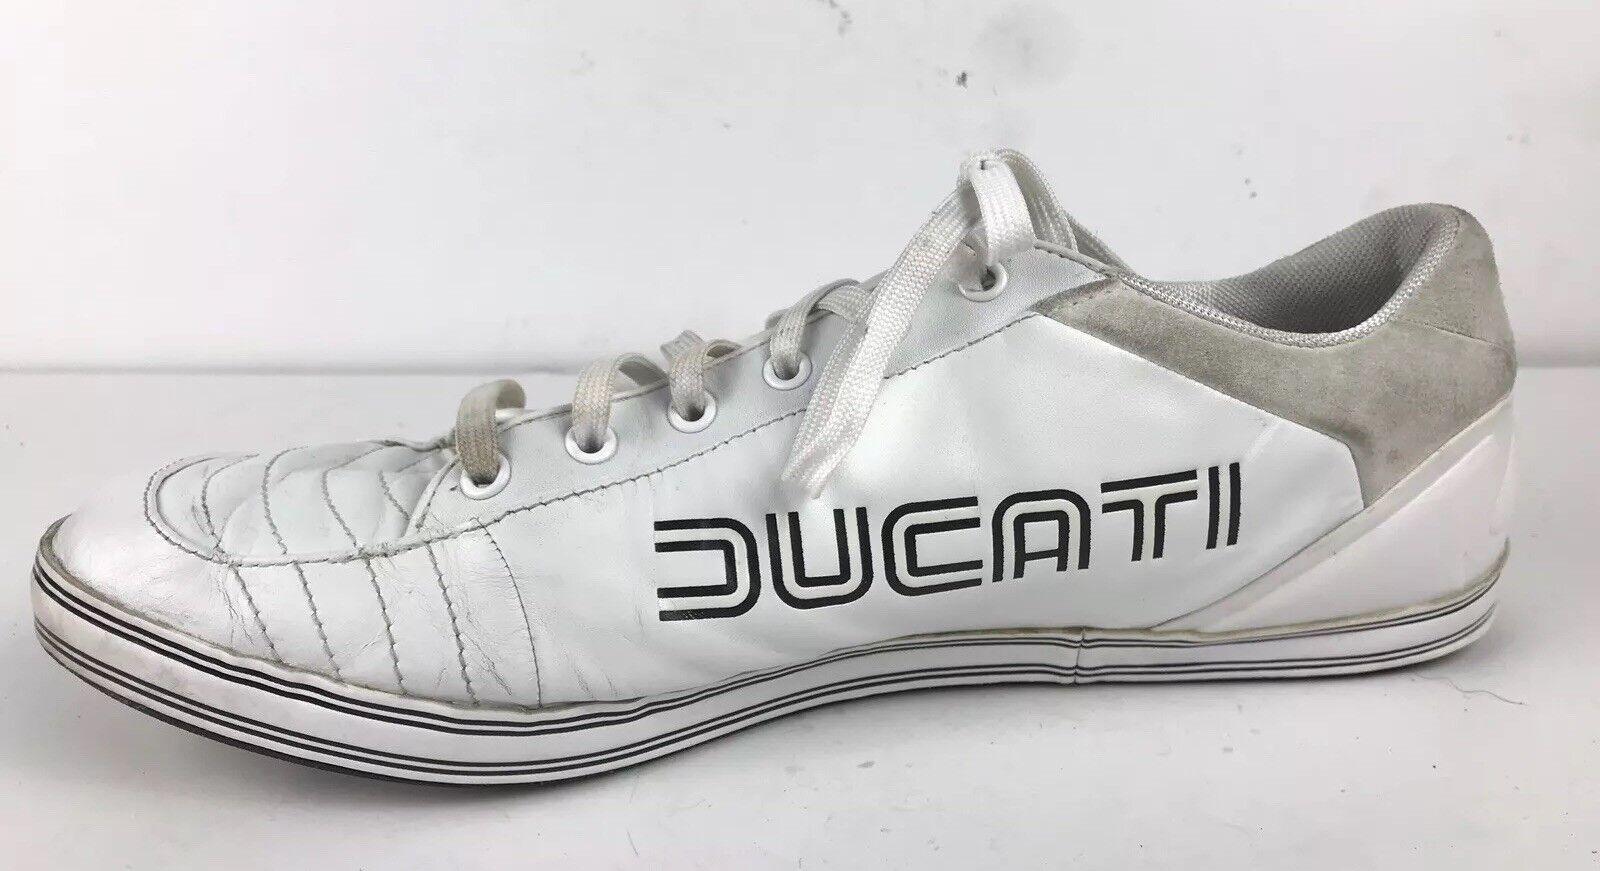 41877b3c5f5 Rare vintage Puma Ducati 65cc White Gym shoes Sports Size 14 US ...